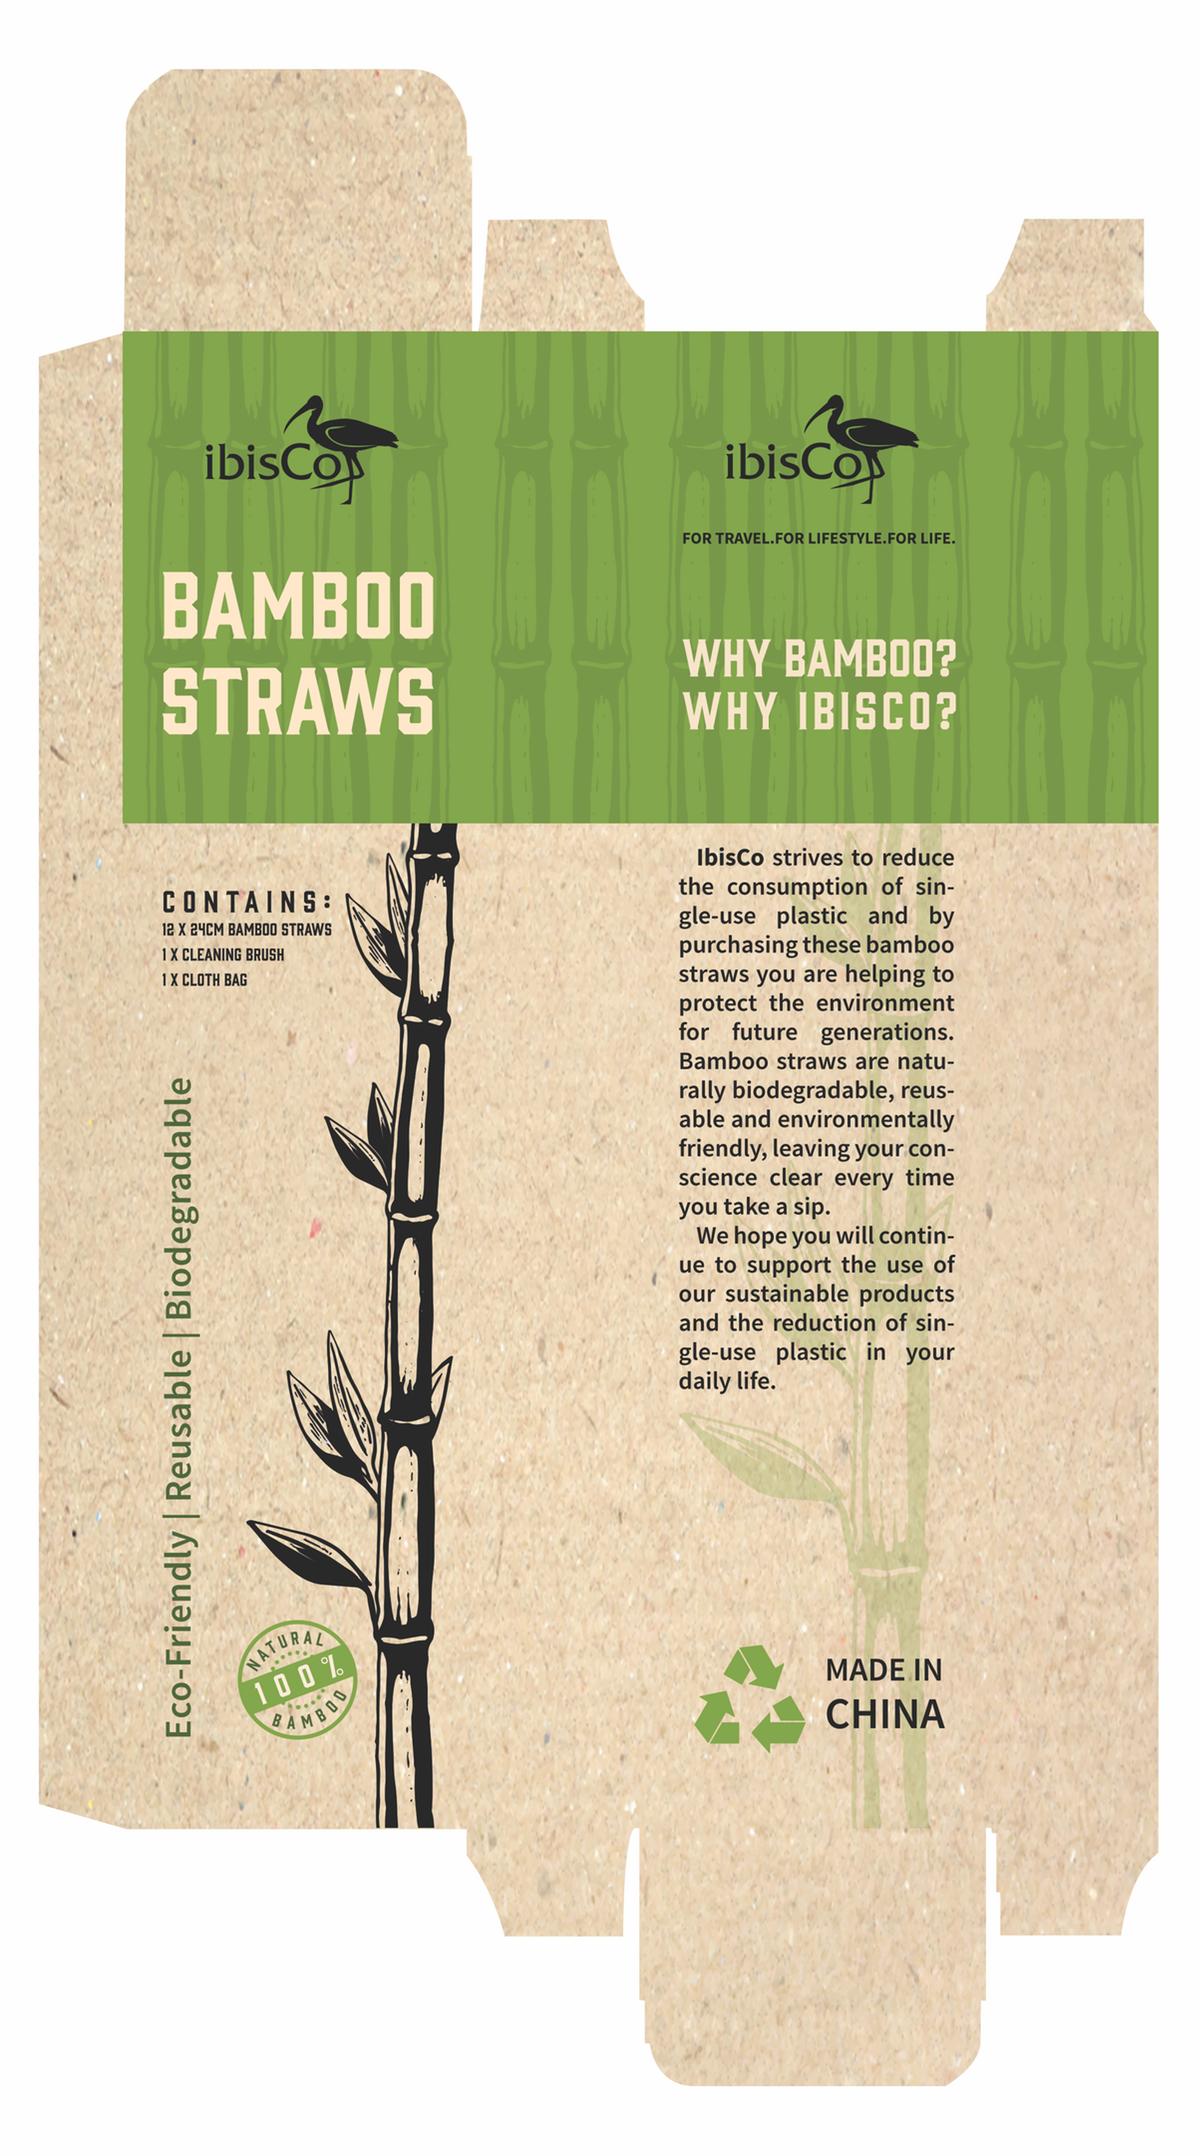 Bamboo straws box